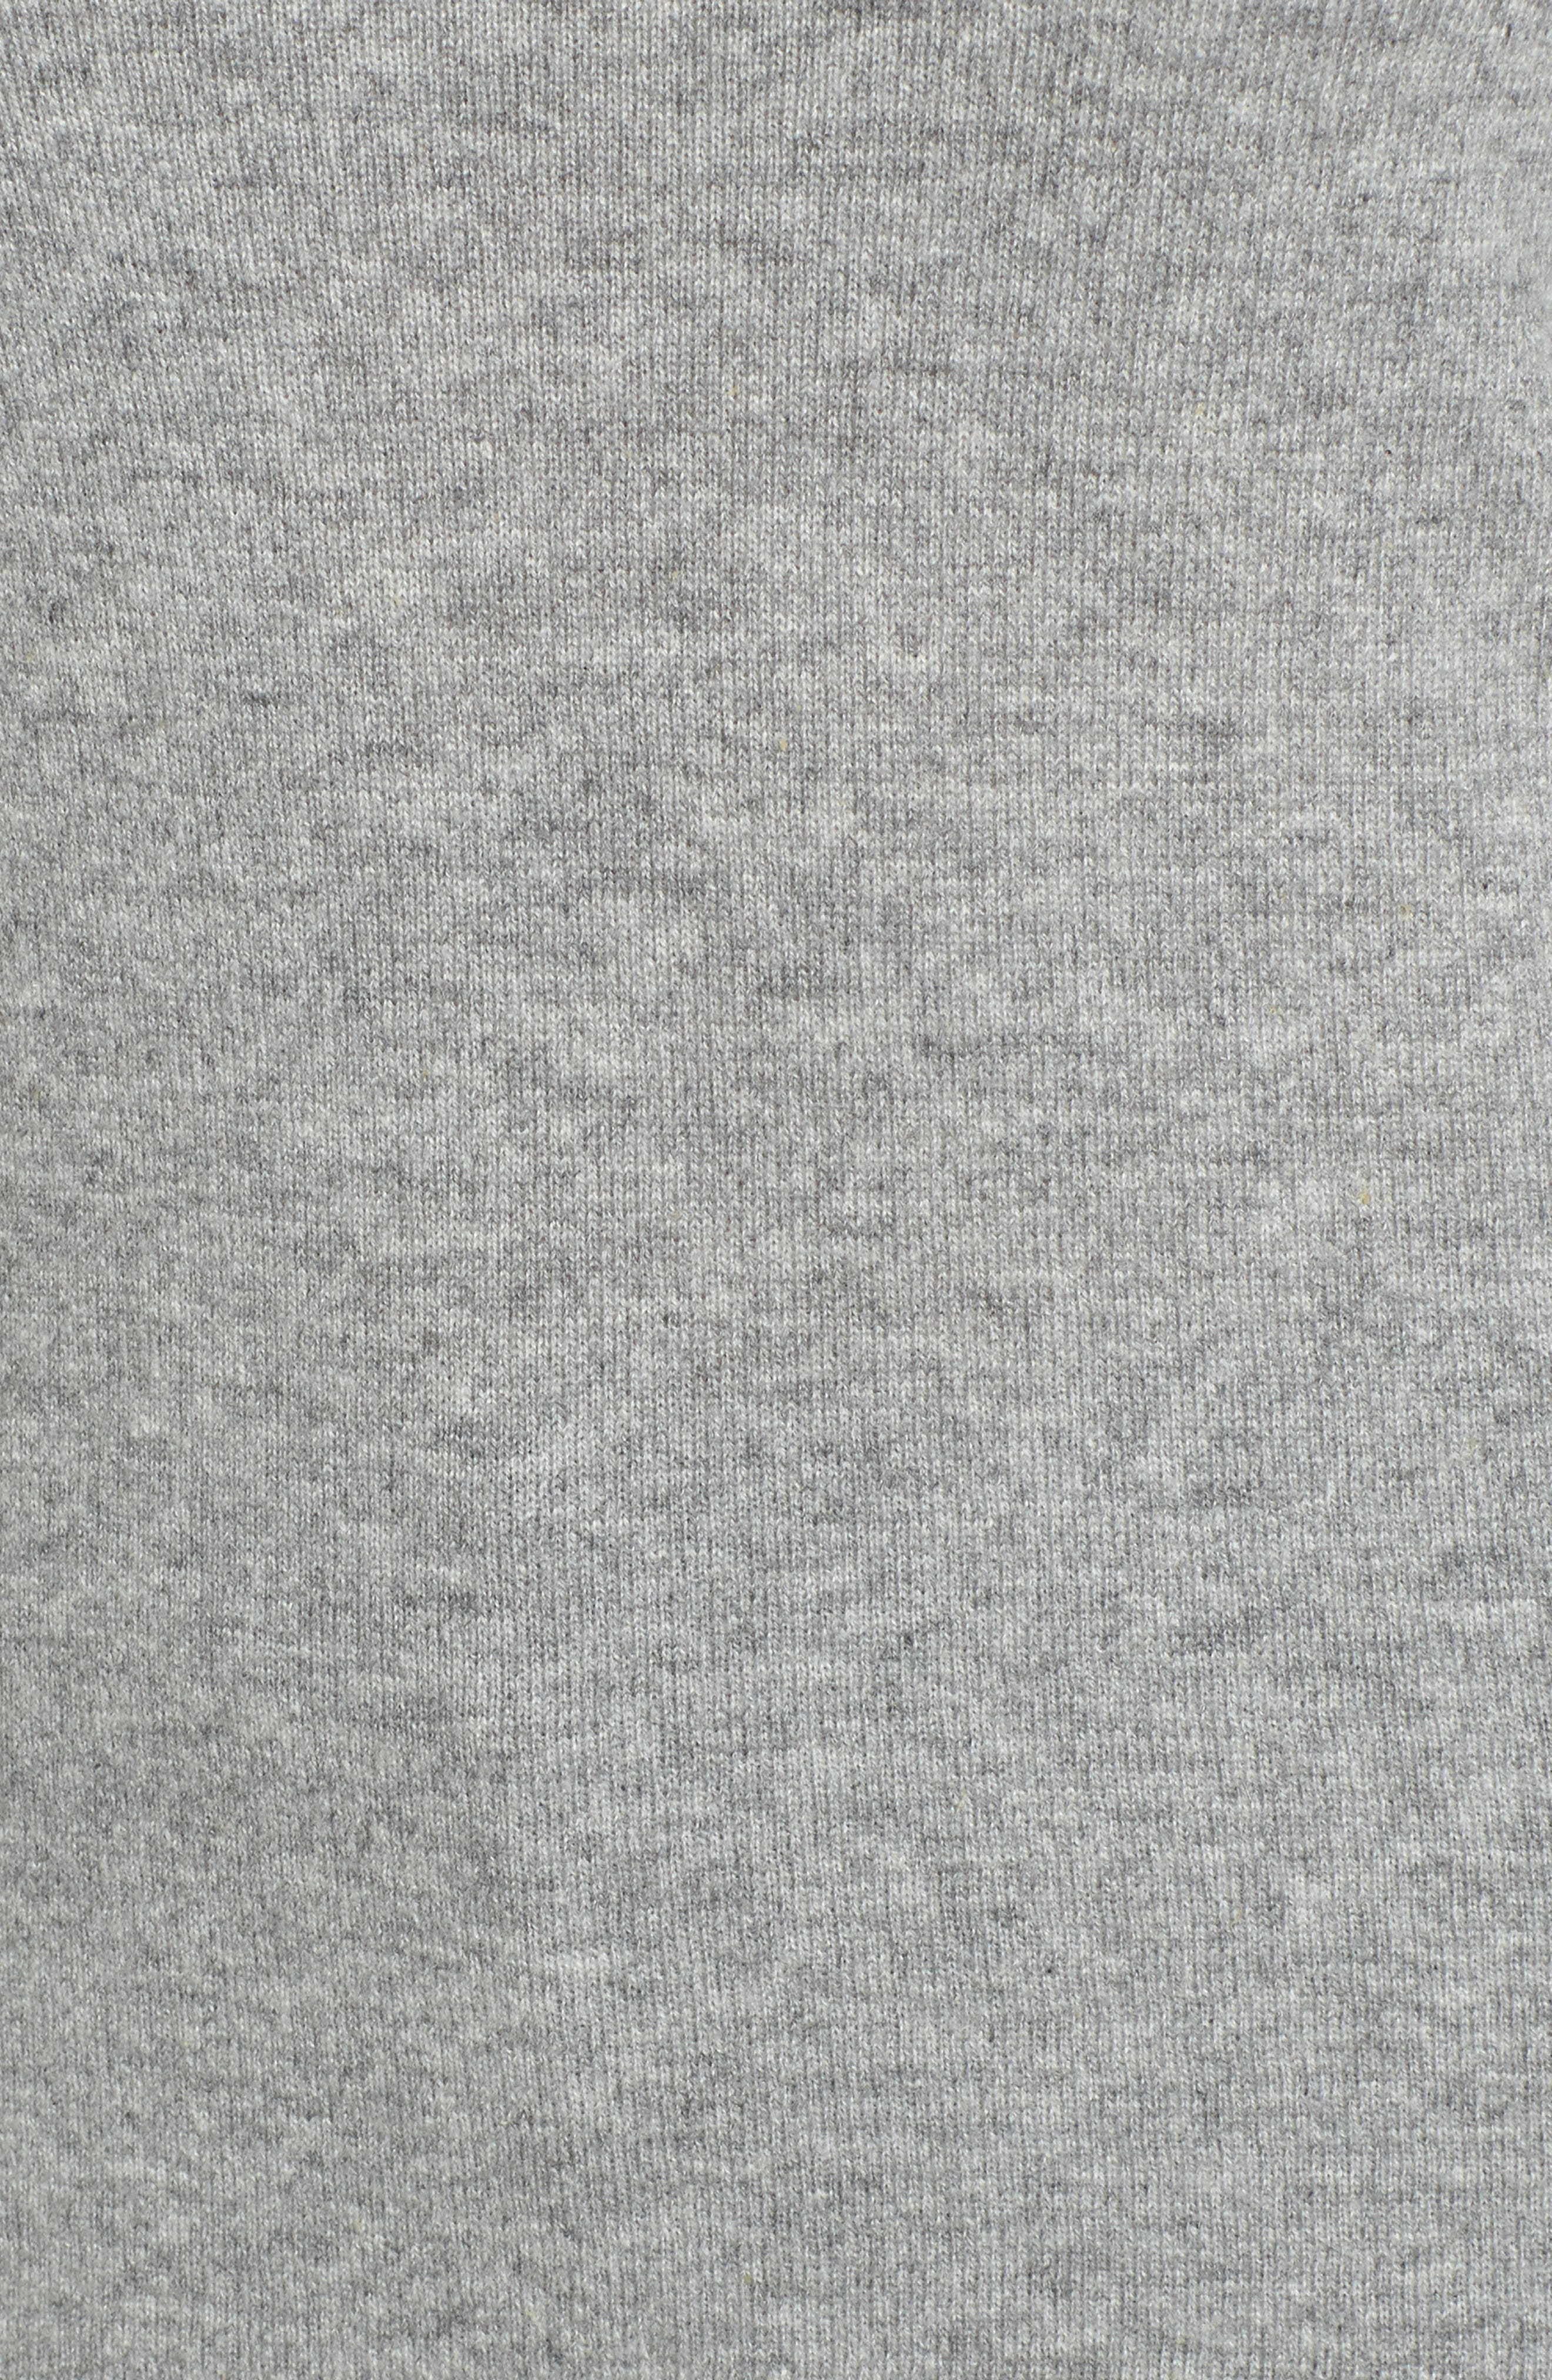 Cashmere V-Neck Sweater,                             Alternate thumbnail 5, color,                             030